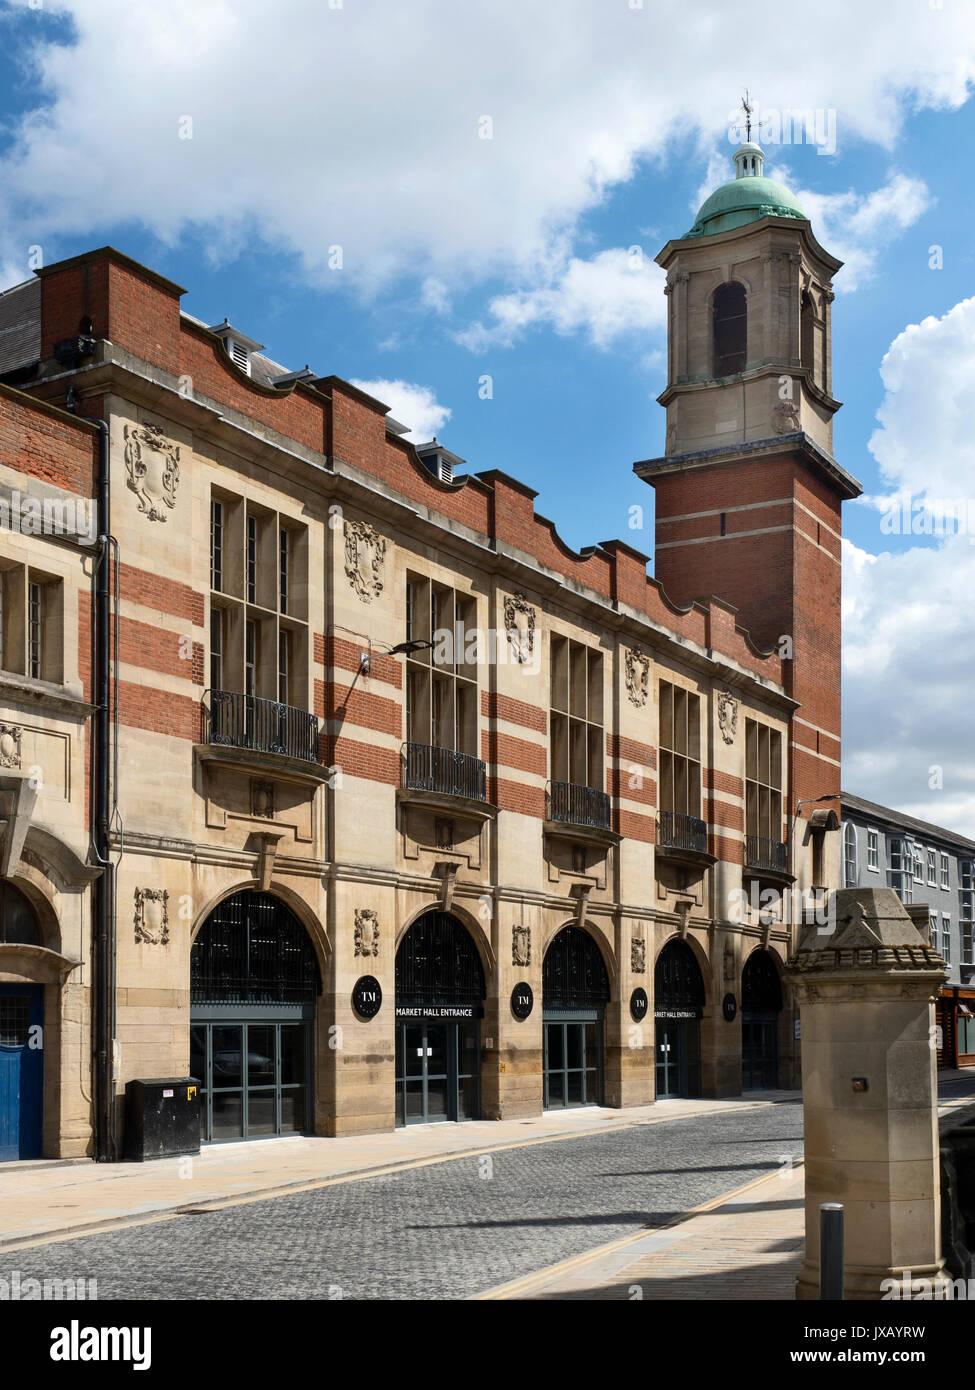 Trinity Market in Hull Hull Yorkshire England - Stock Image